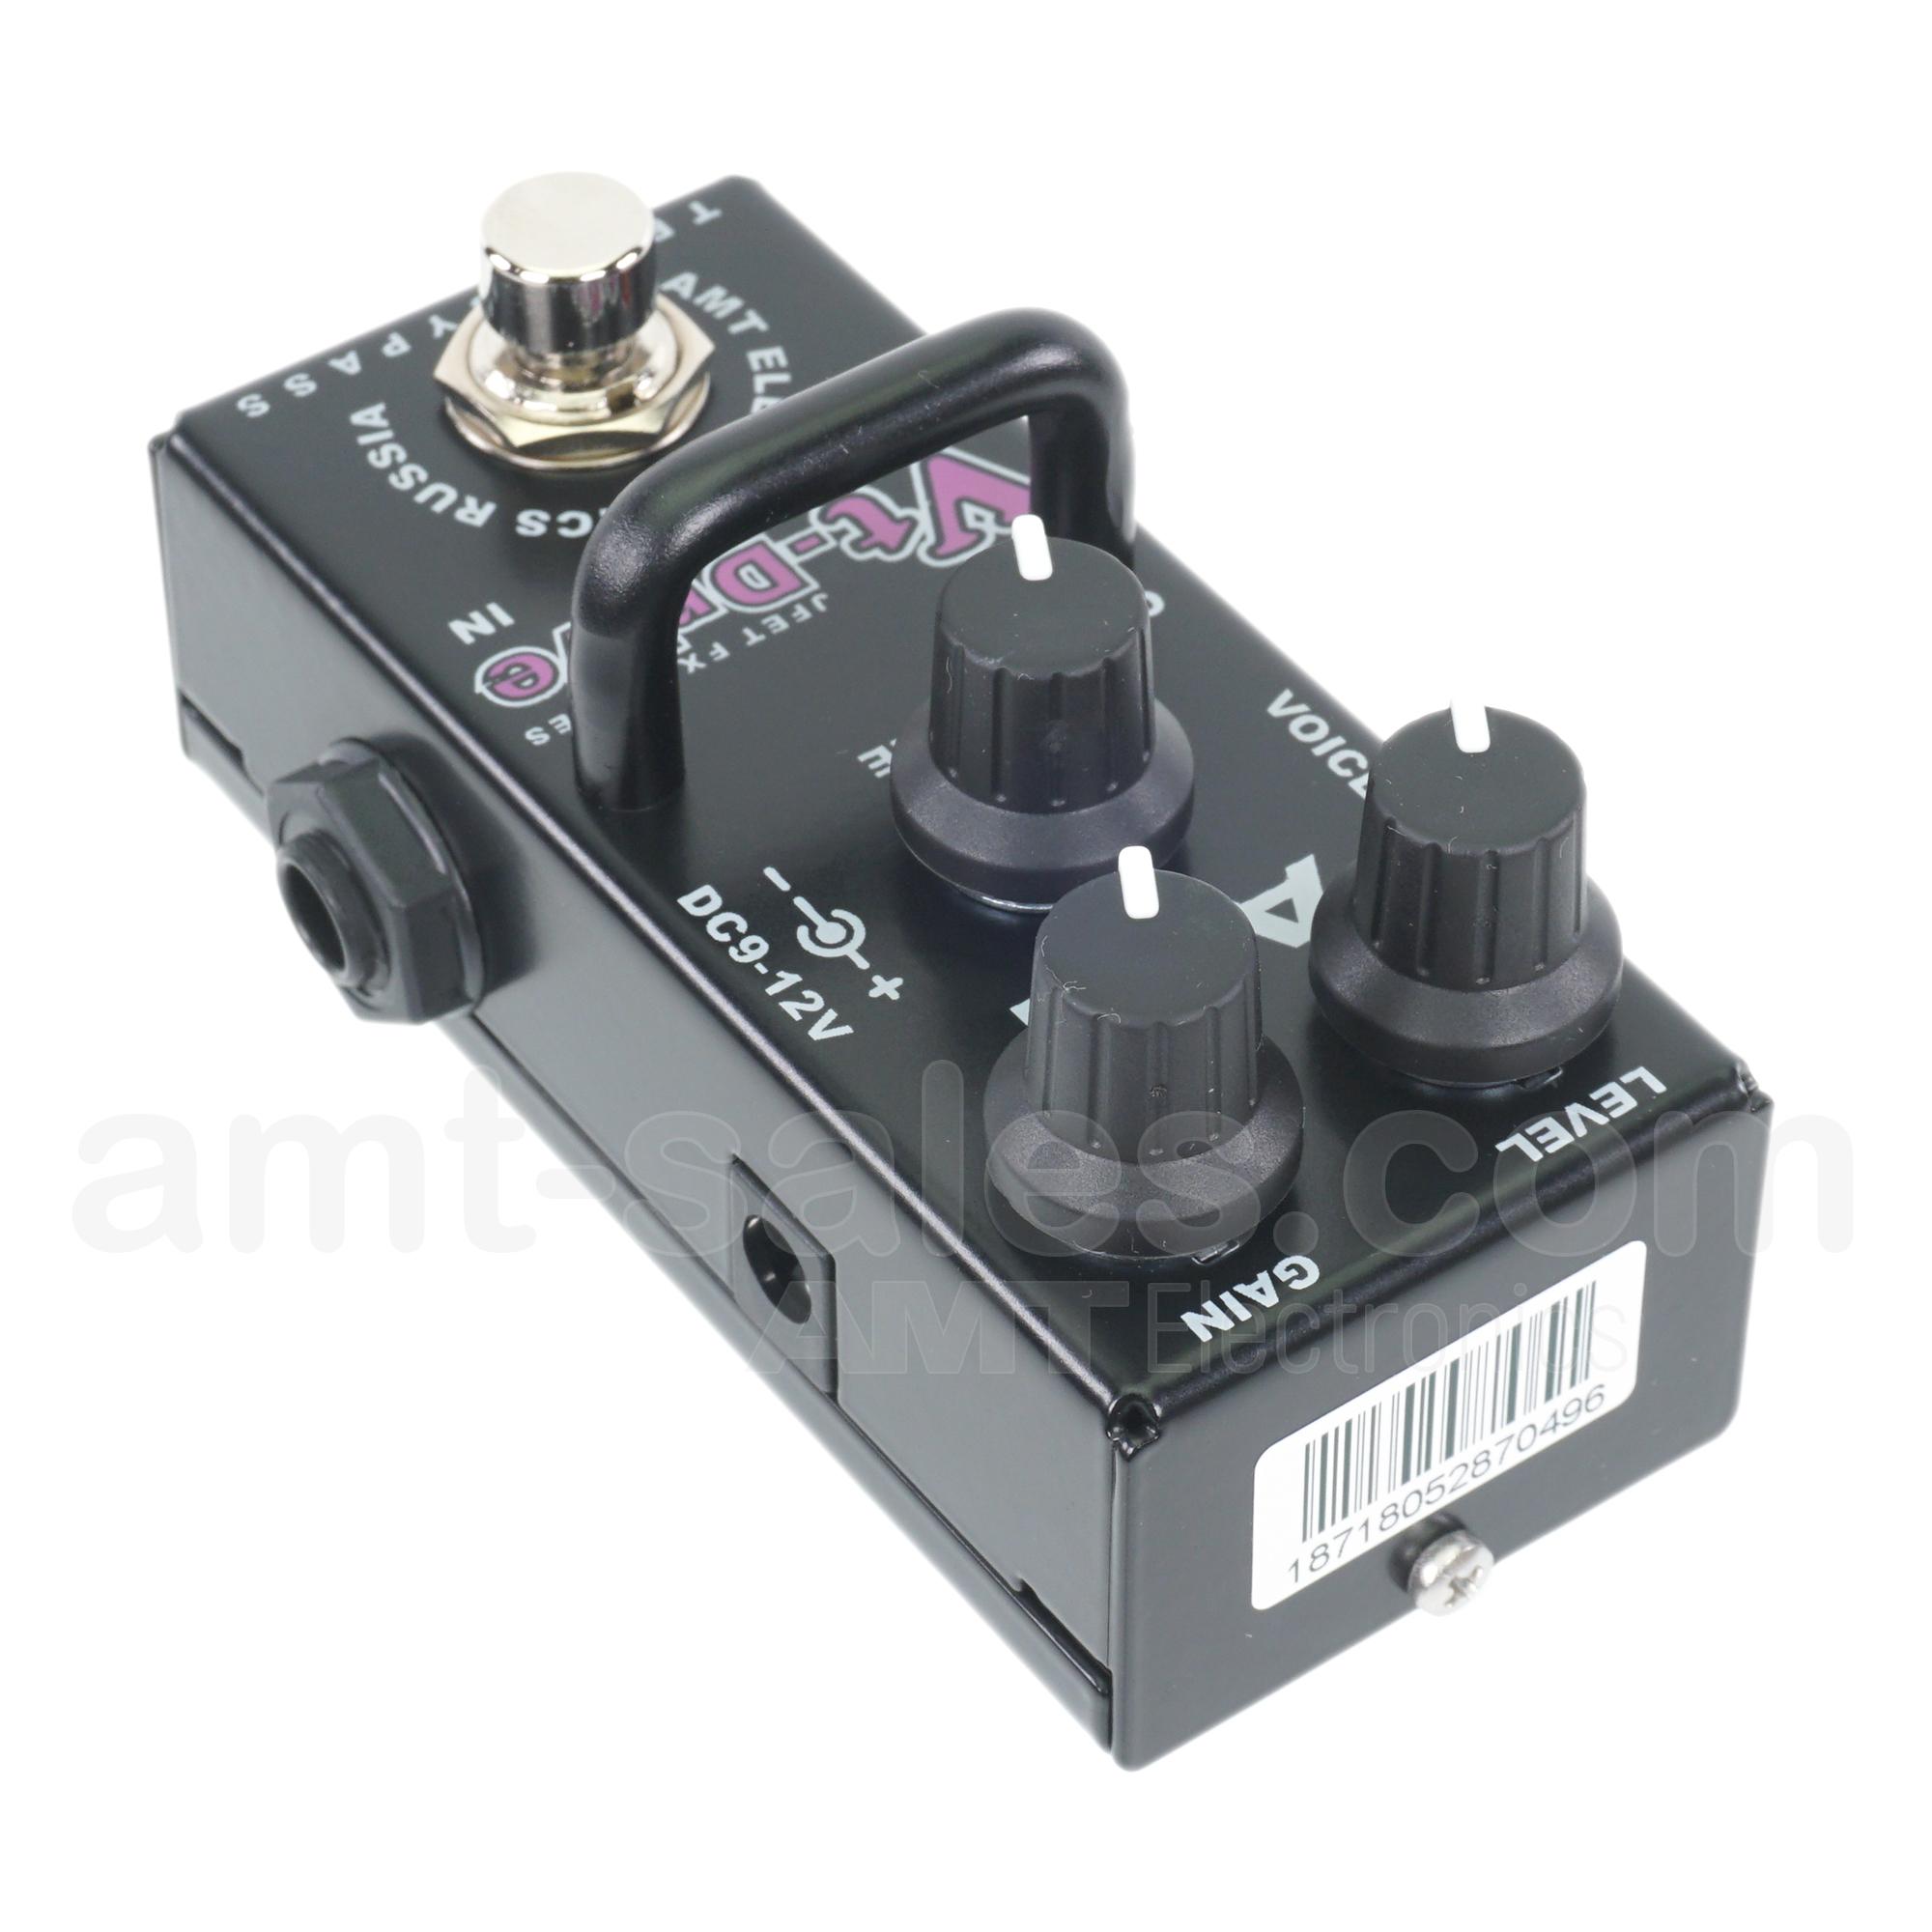 AMT Vt-Drive mini - JFET distortion pedal